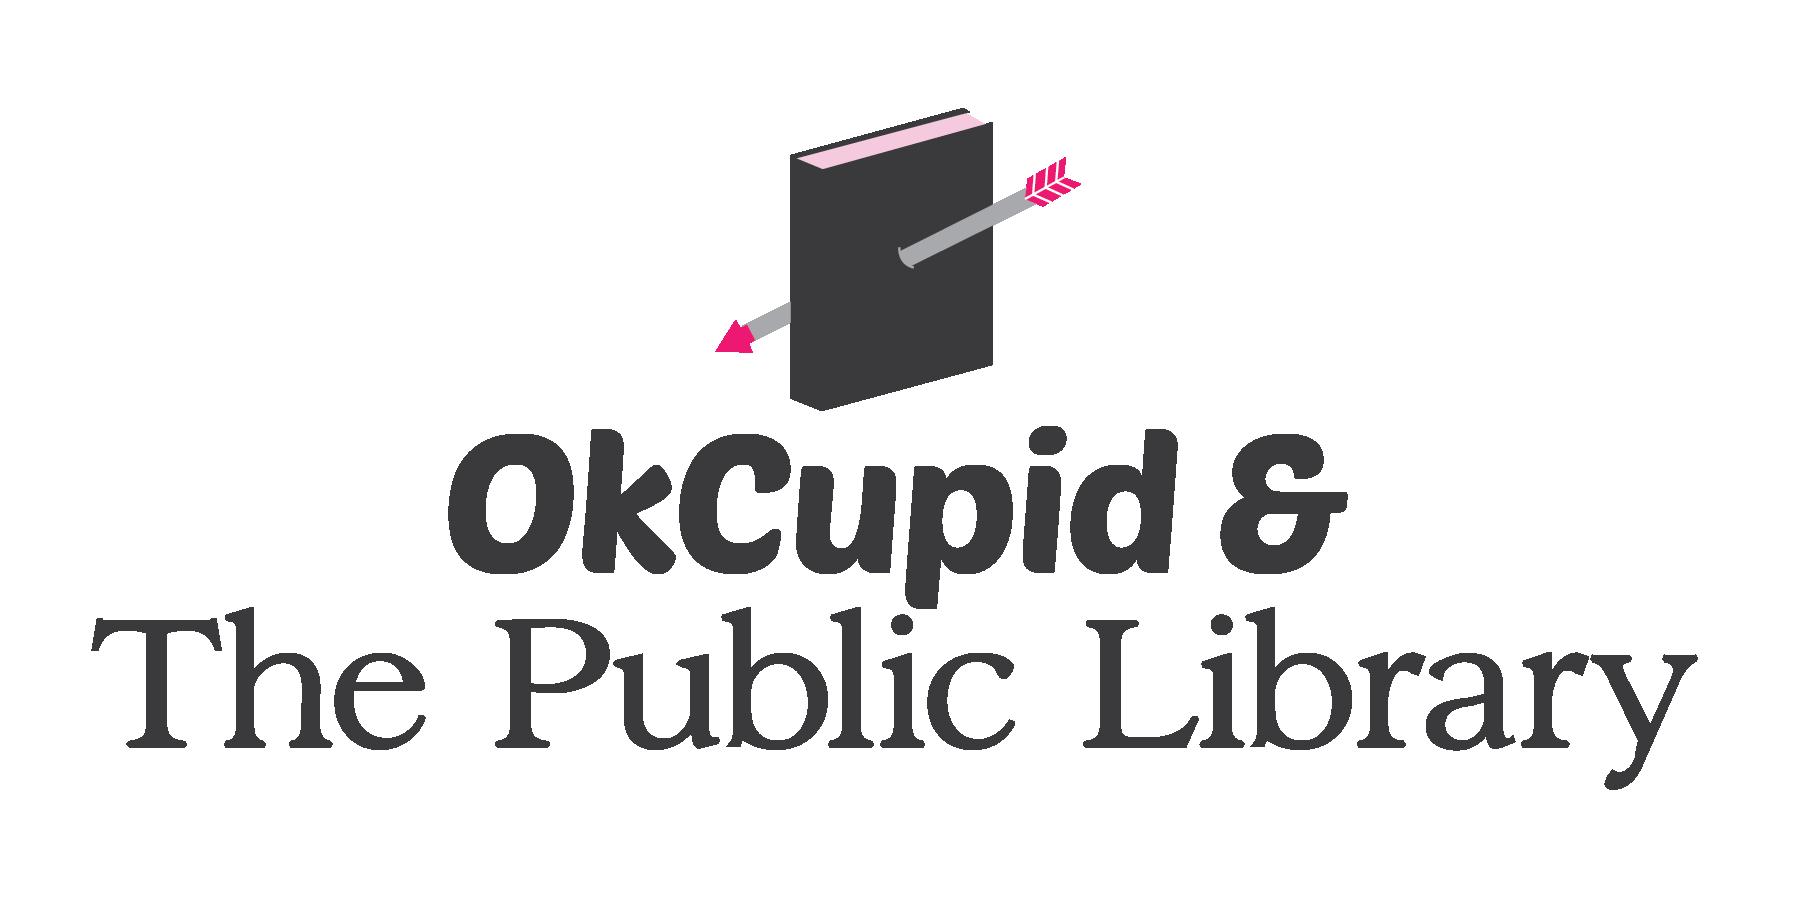 Logo Design, The Public Library & OkCupid